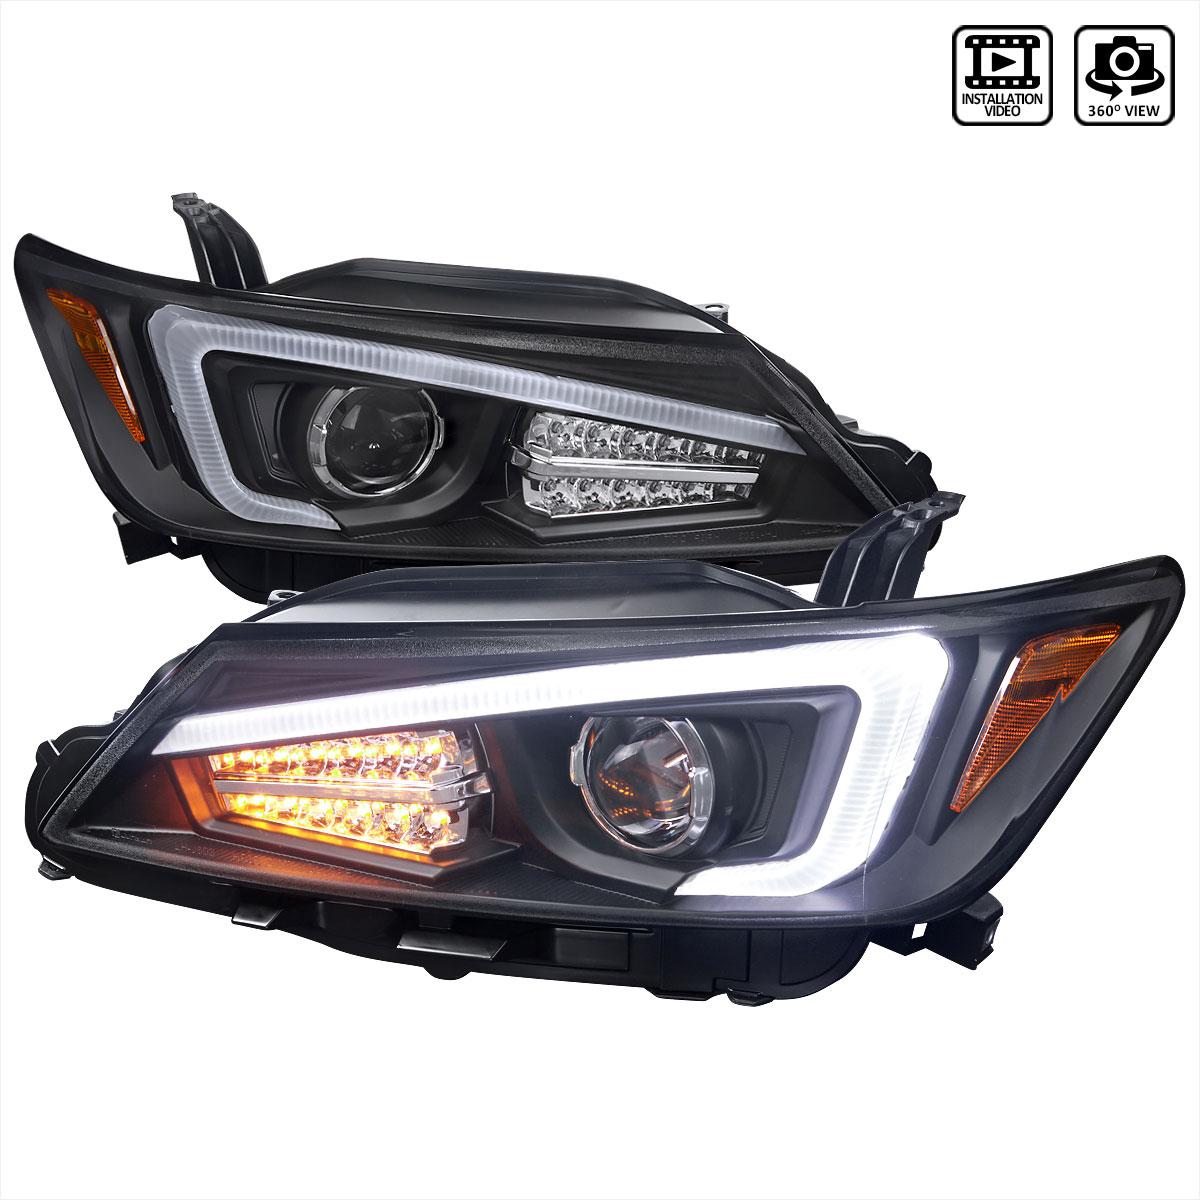 Scion Tc Headlights >> Spec D Tuning 2lhp Tc11jm Tm Scion Tc Projector Headlights With Led Light Bar Black 2011 2013